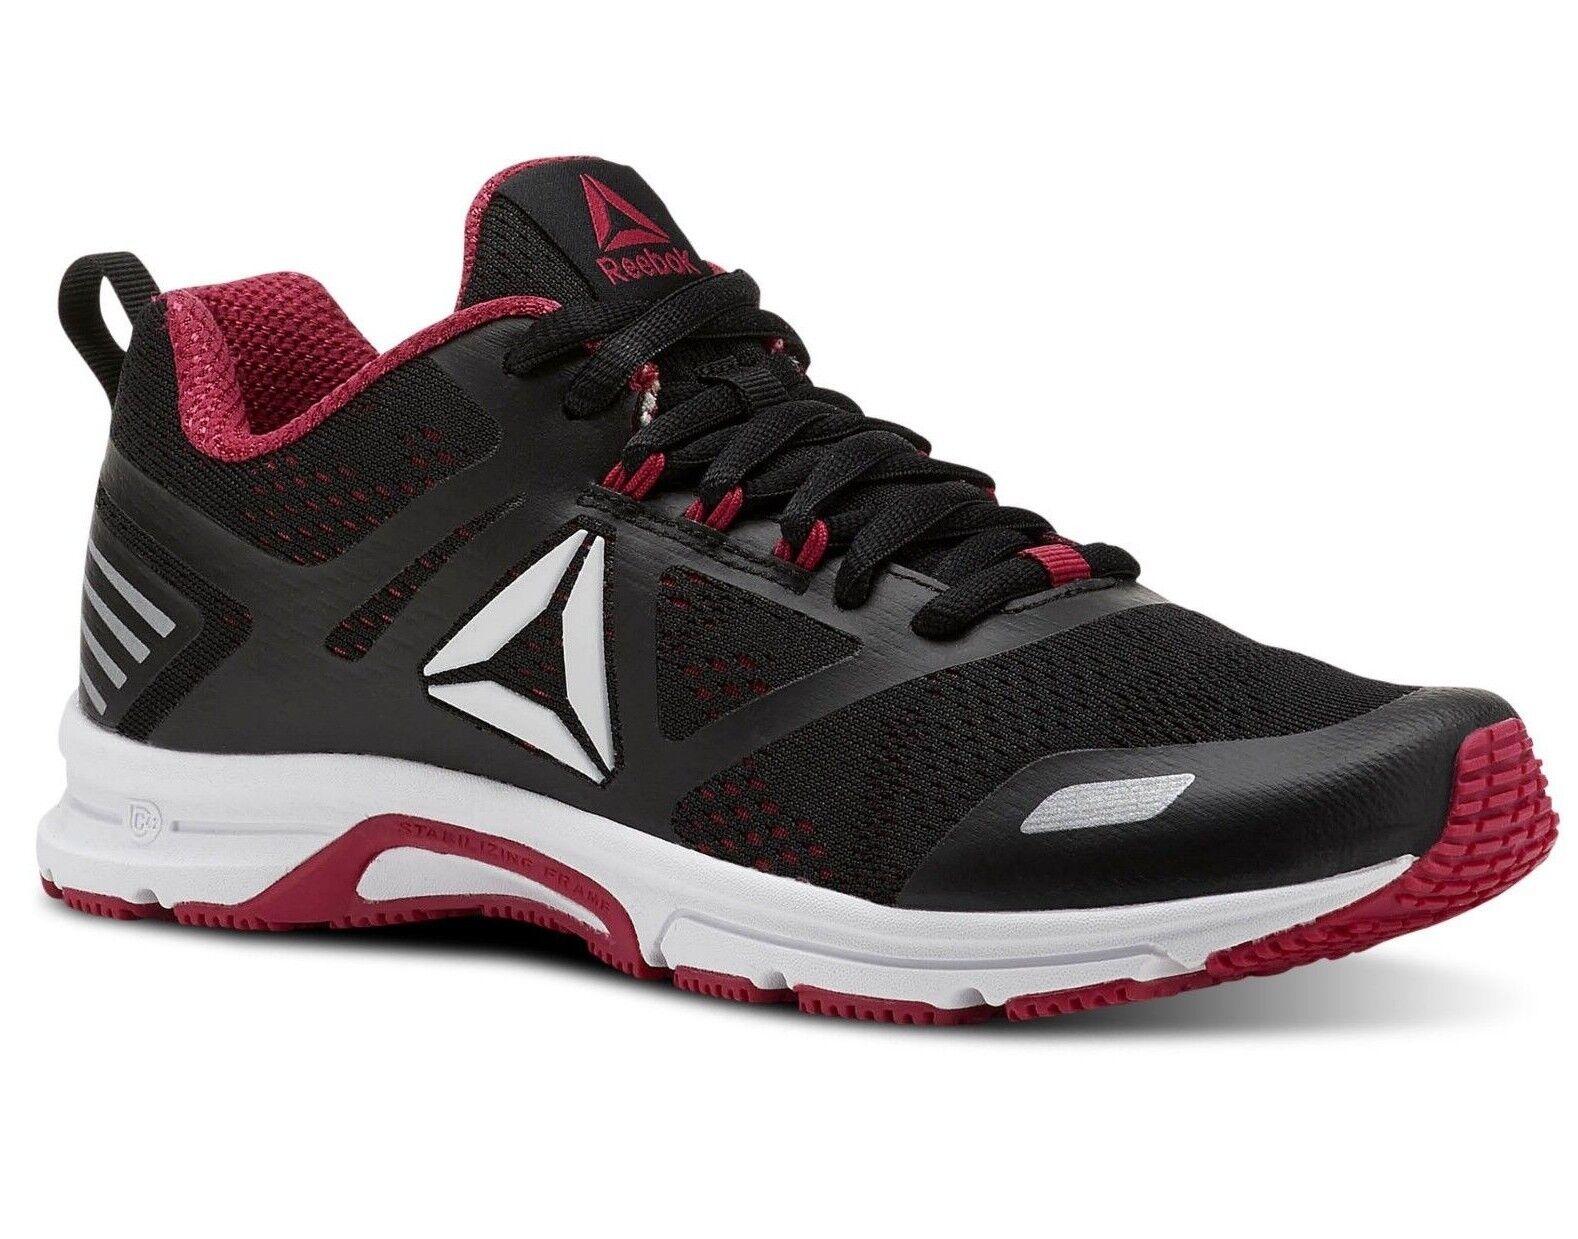 Reebok Women Running Shoes Ahary Runner Gym Sports Trainer Workout CN5346 New